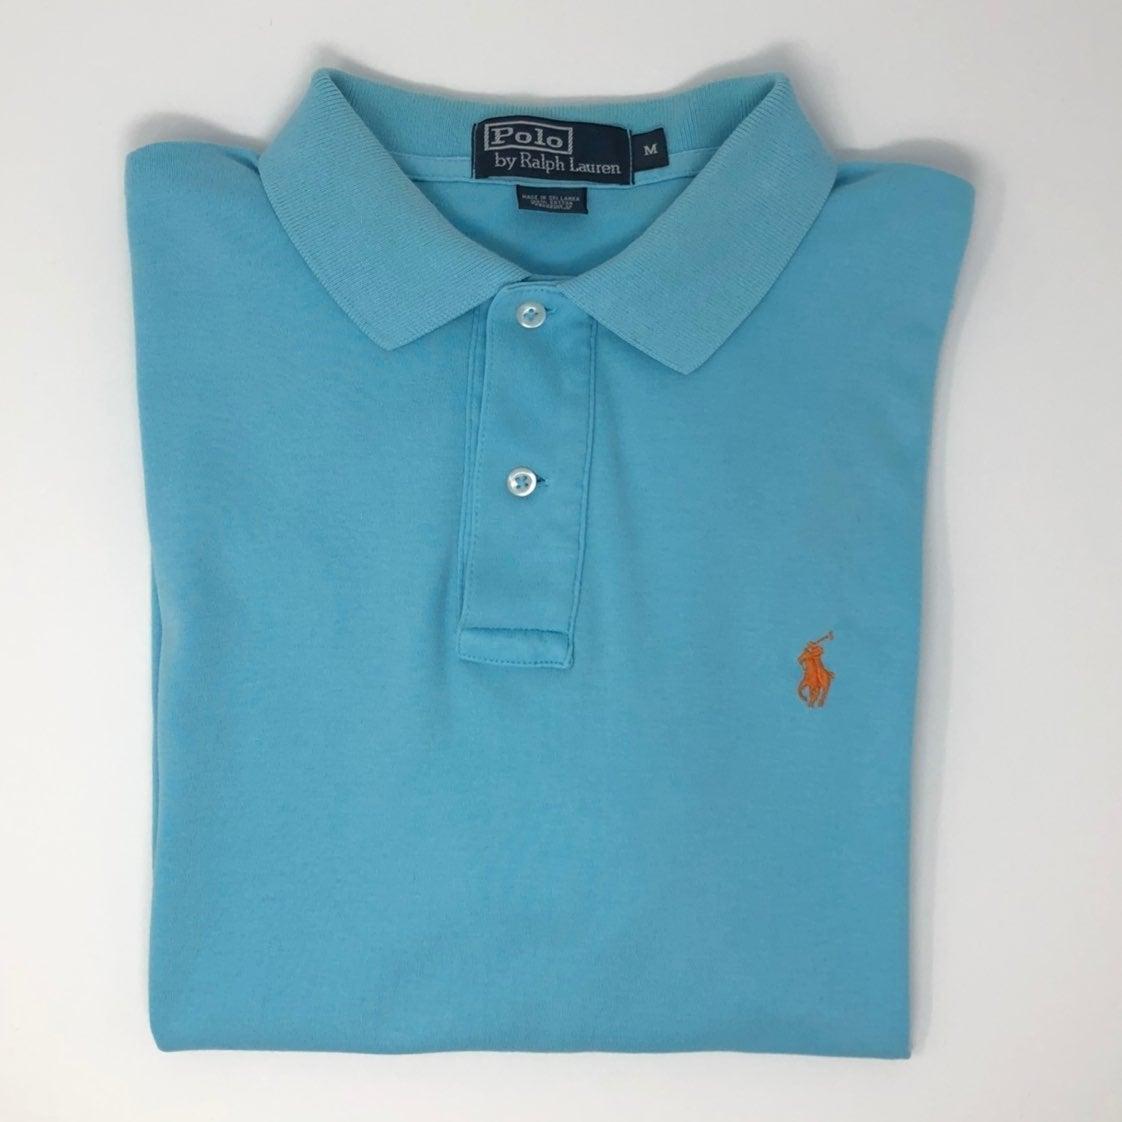 Polo By Ralph Lauren Polo Shirt Size M